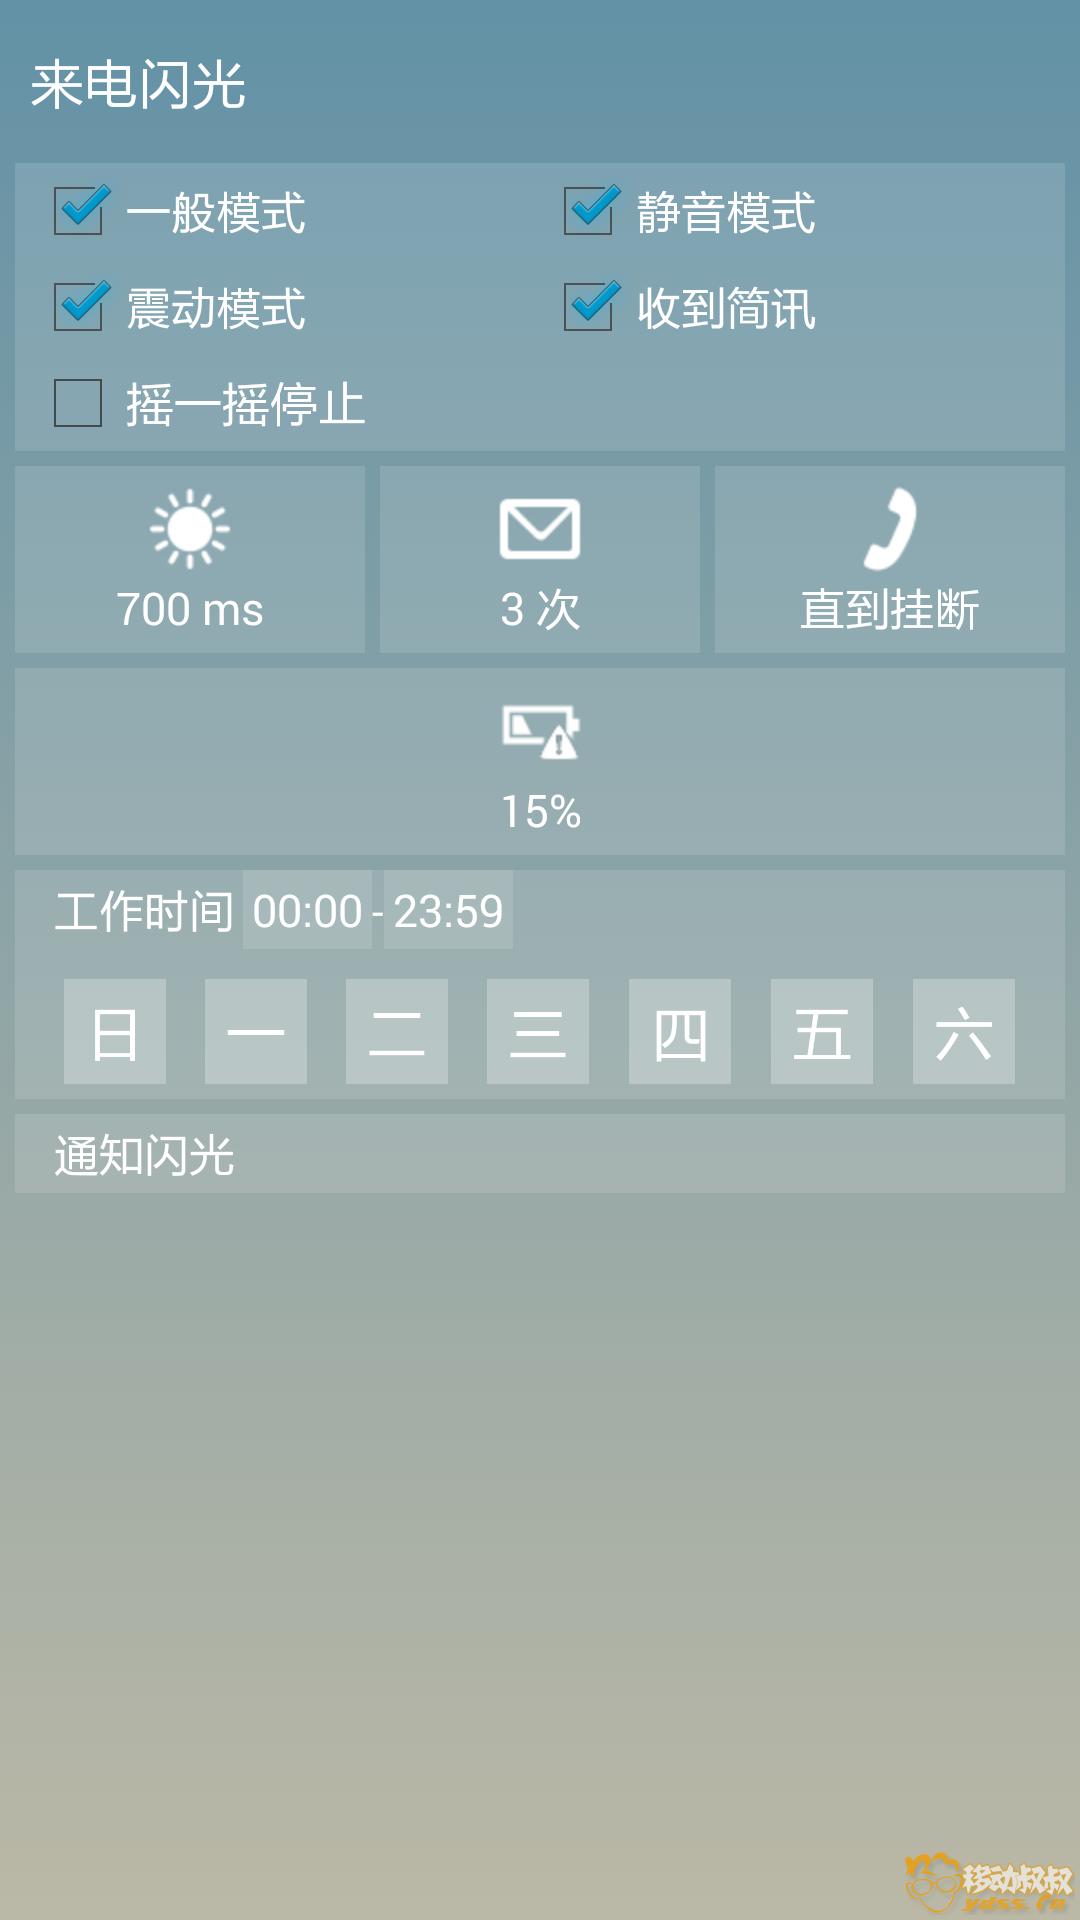 Screenshot_2018-04-23-14-06-15.png